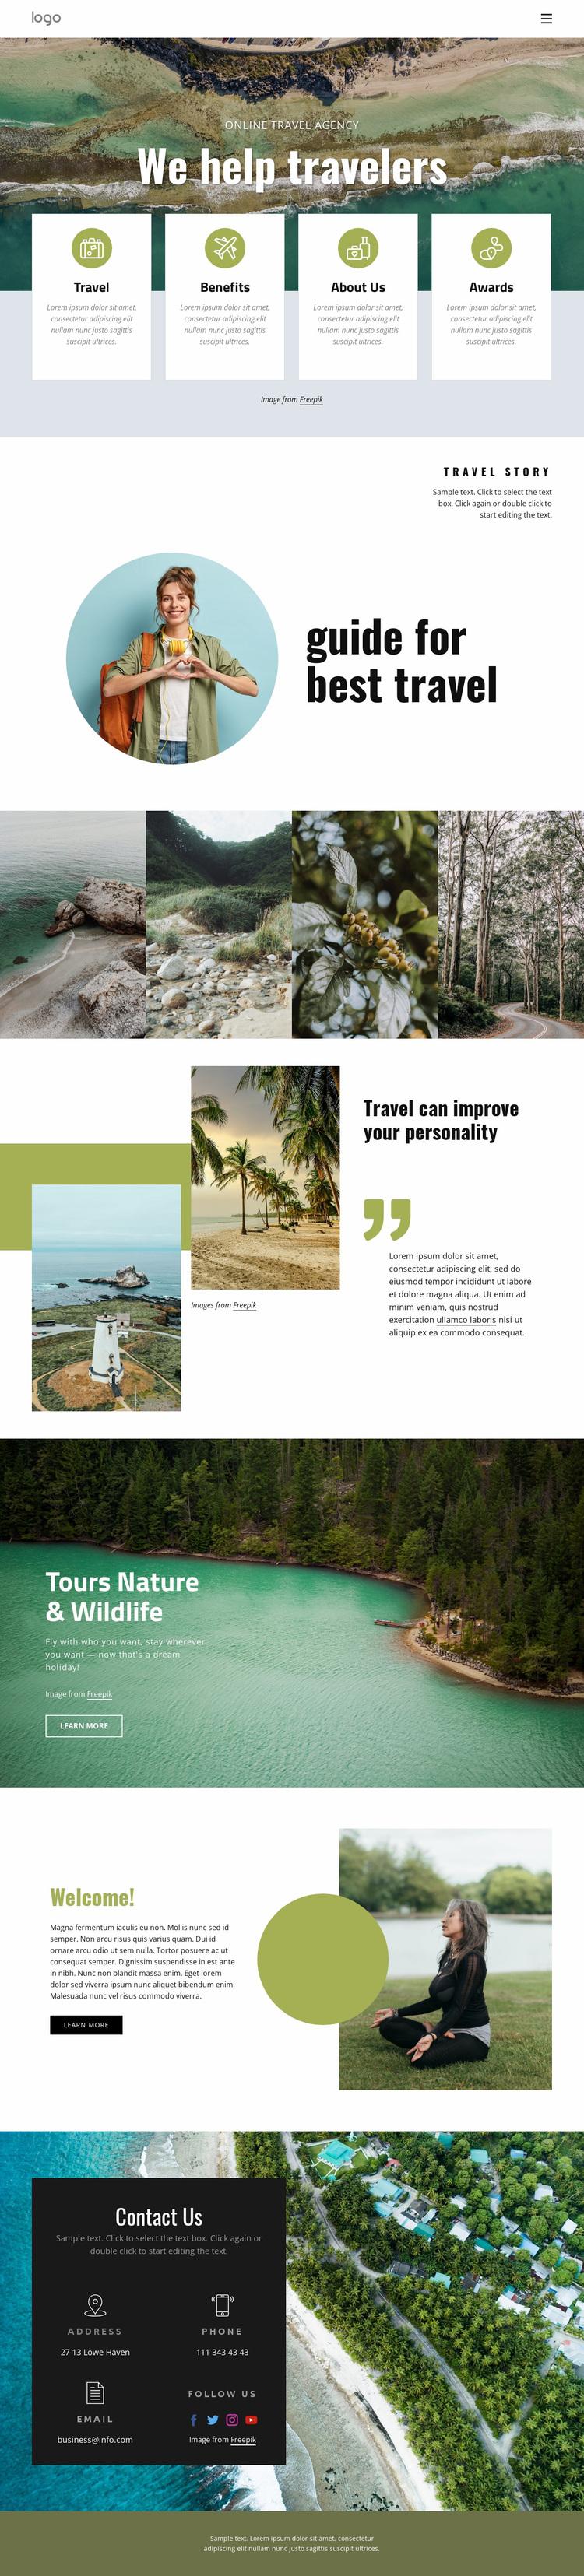 We help manage your trip Website Design